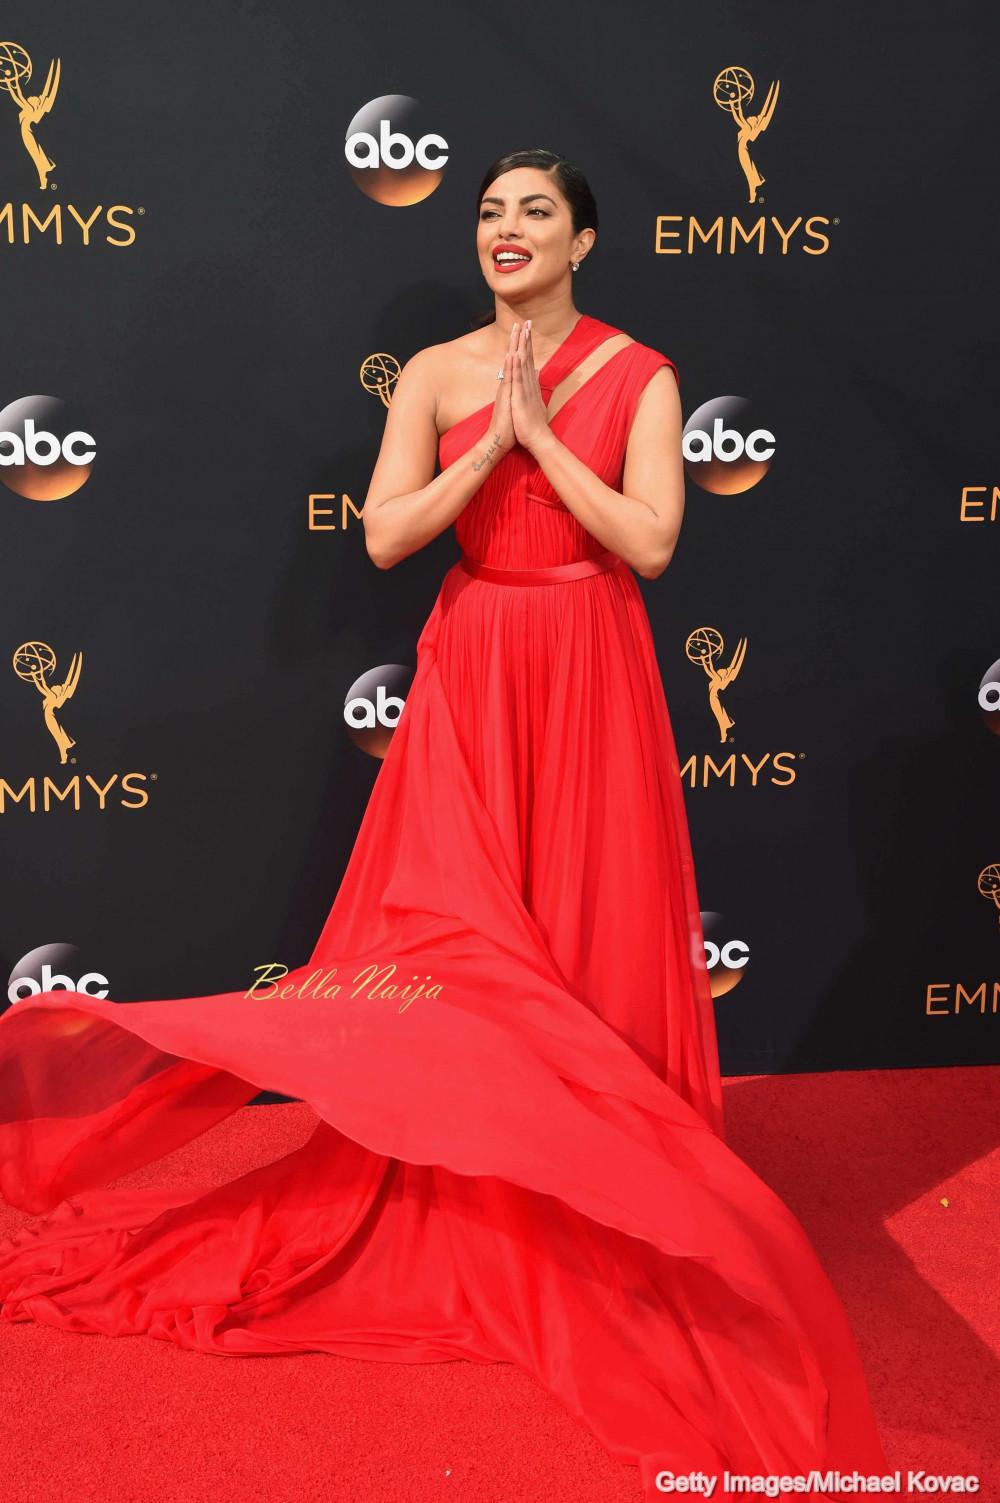 BN Red Carpet Fab: 2016 Emmy Awards - BellaNaija Emmy Awards